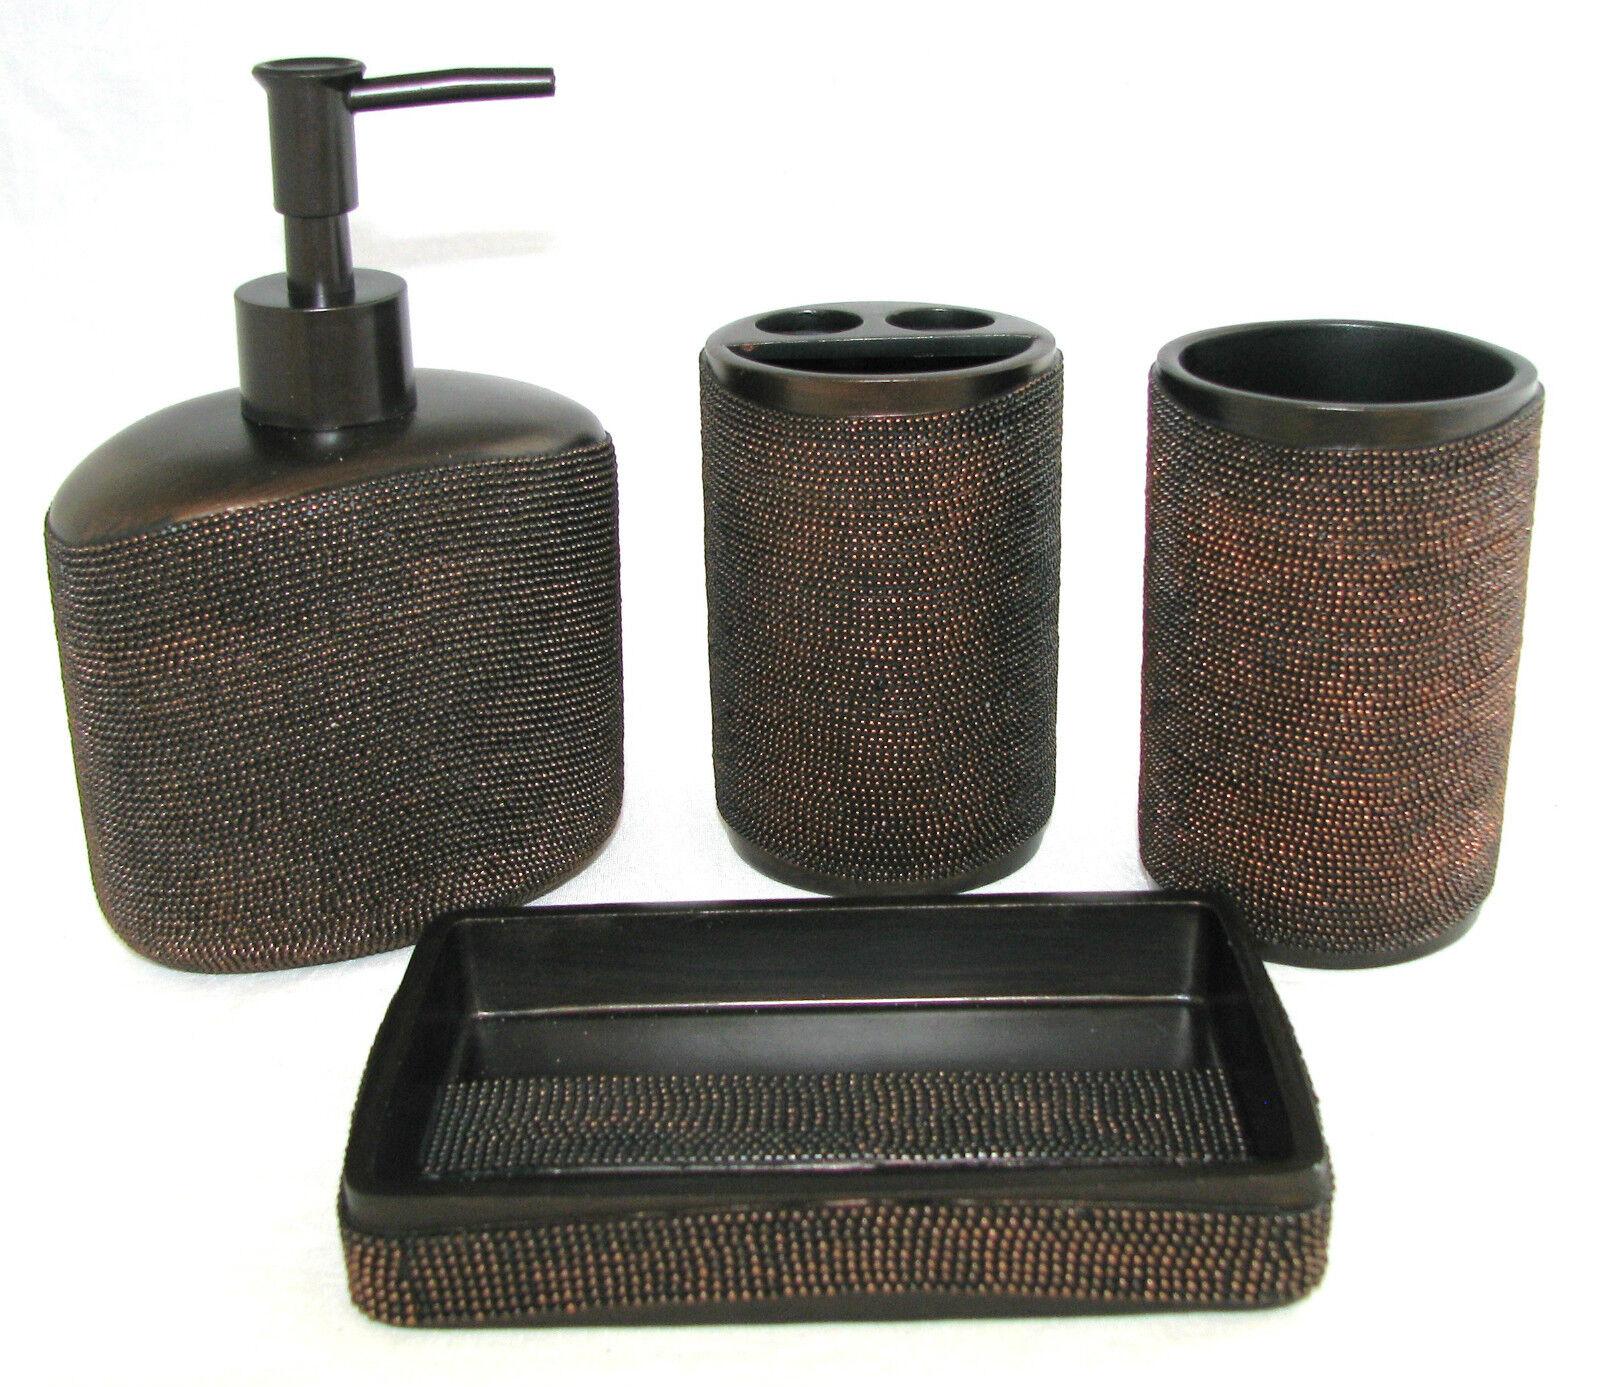 4 PC SET braun COPPER RESIN DOT DESIGN SOAP DISPENSER+TOOTHBRUSH+TUMBLER+DISH